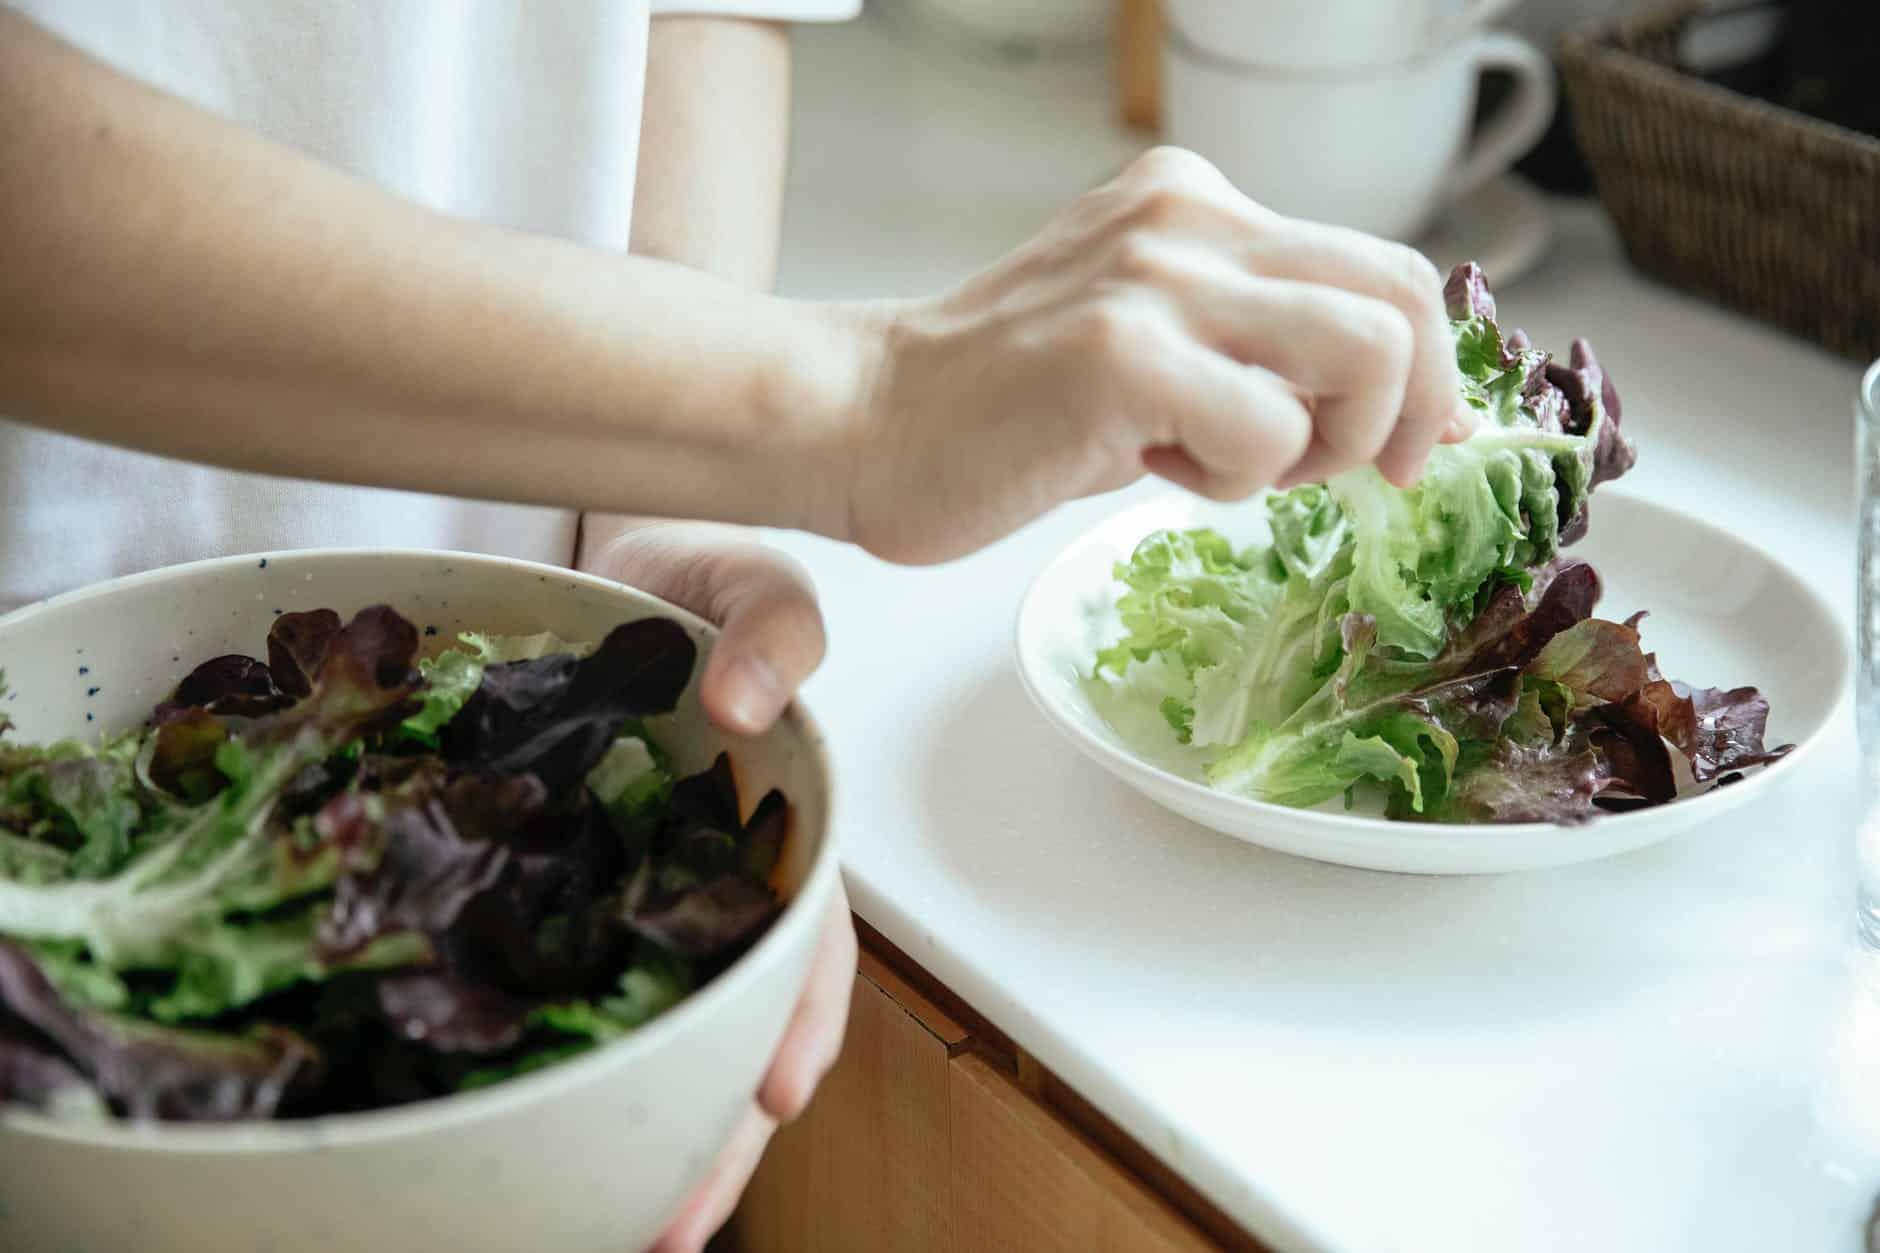 salade verte frisée astuces conservation